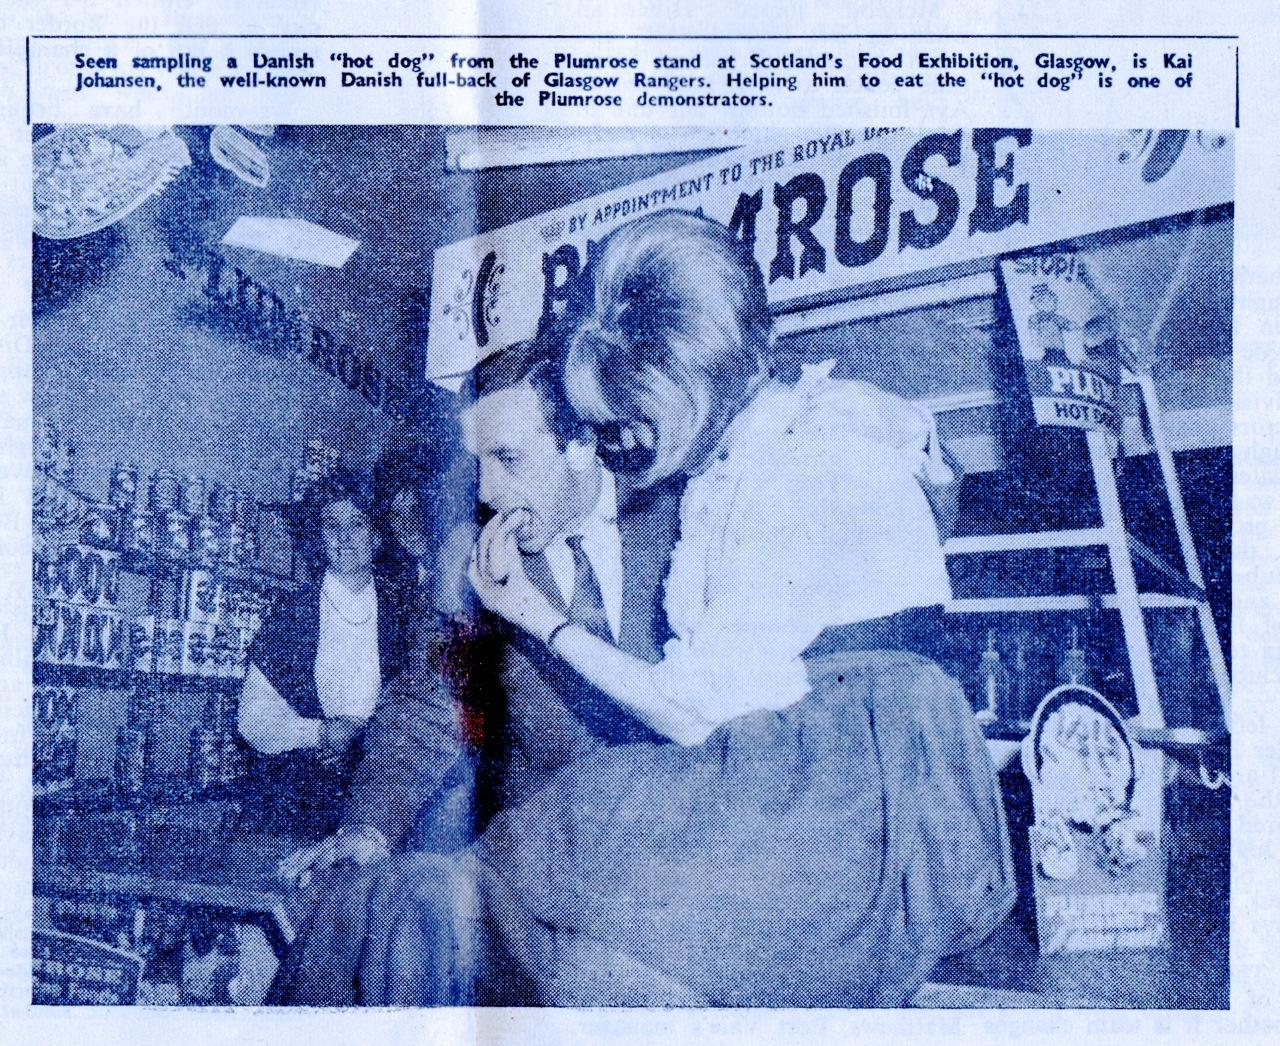 Kaj Johansen, Rangers 1966-2 – Beyond The Last Man